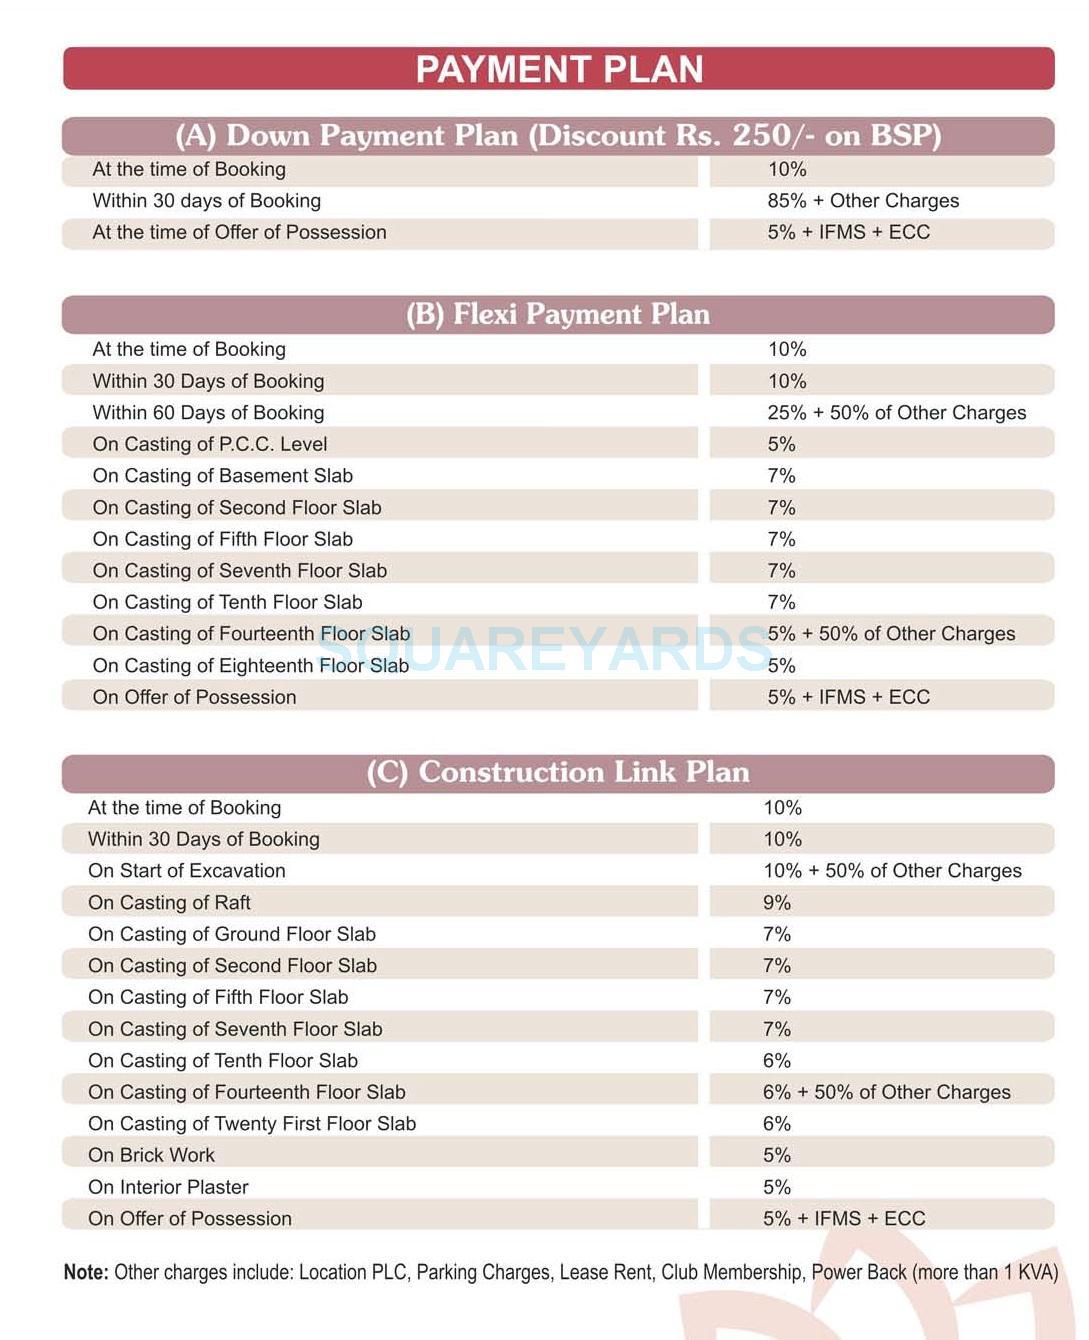 bulland calisto payment plan image1